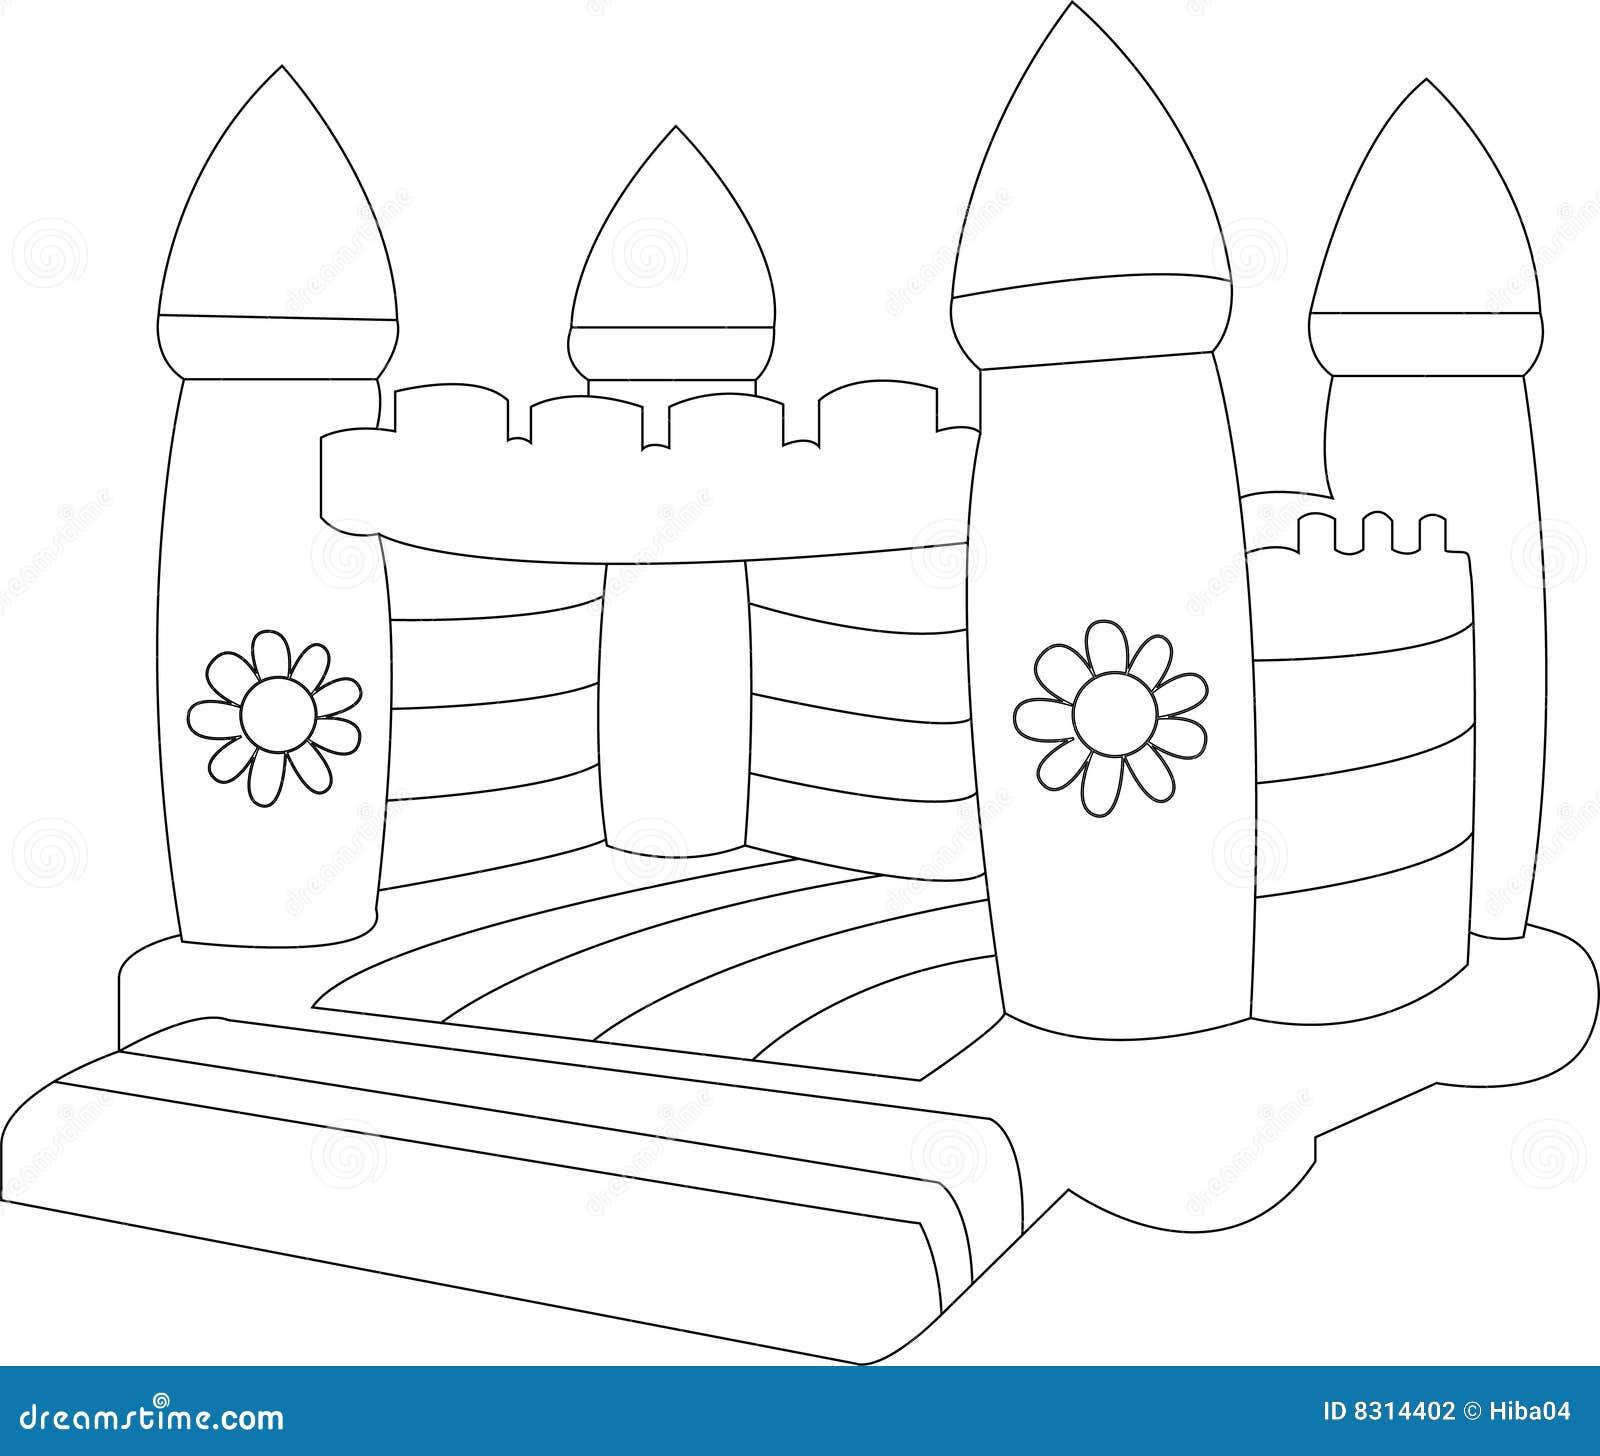 Blank Bouncy castle stock vector